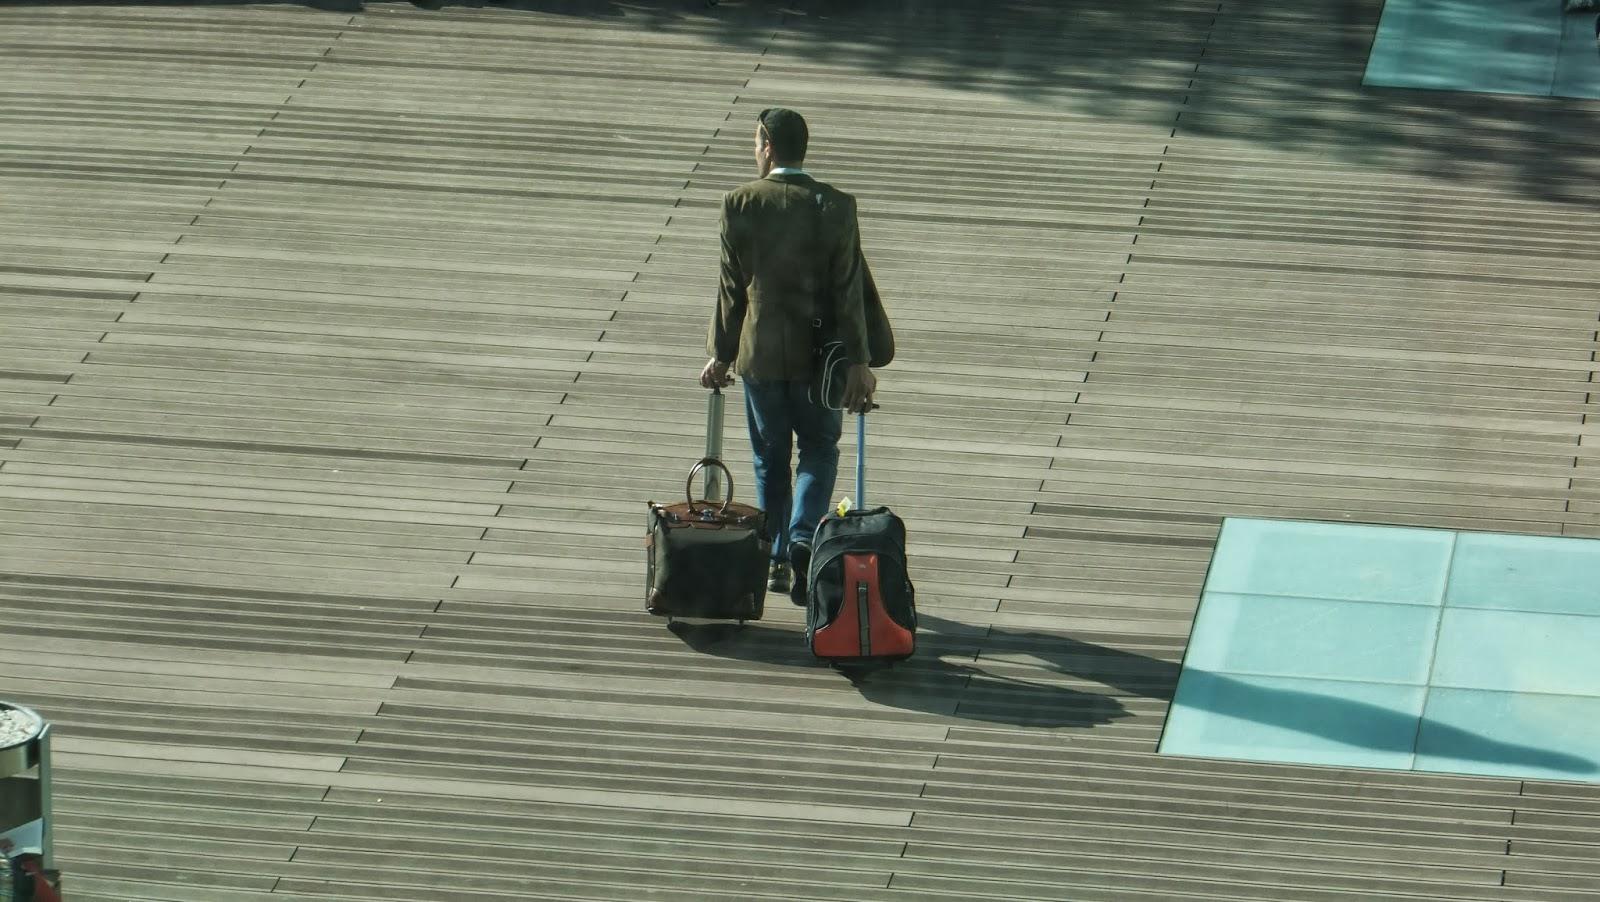 Aeropuerto El Prat, Barcelona, Elisa N, Blog de Viajes, Lifestyle, Travel